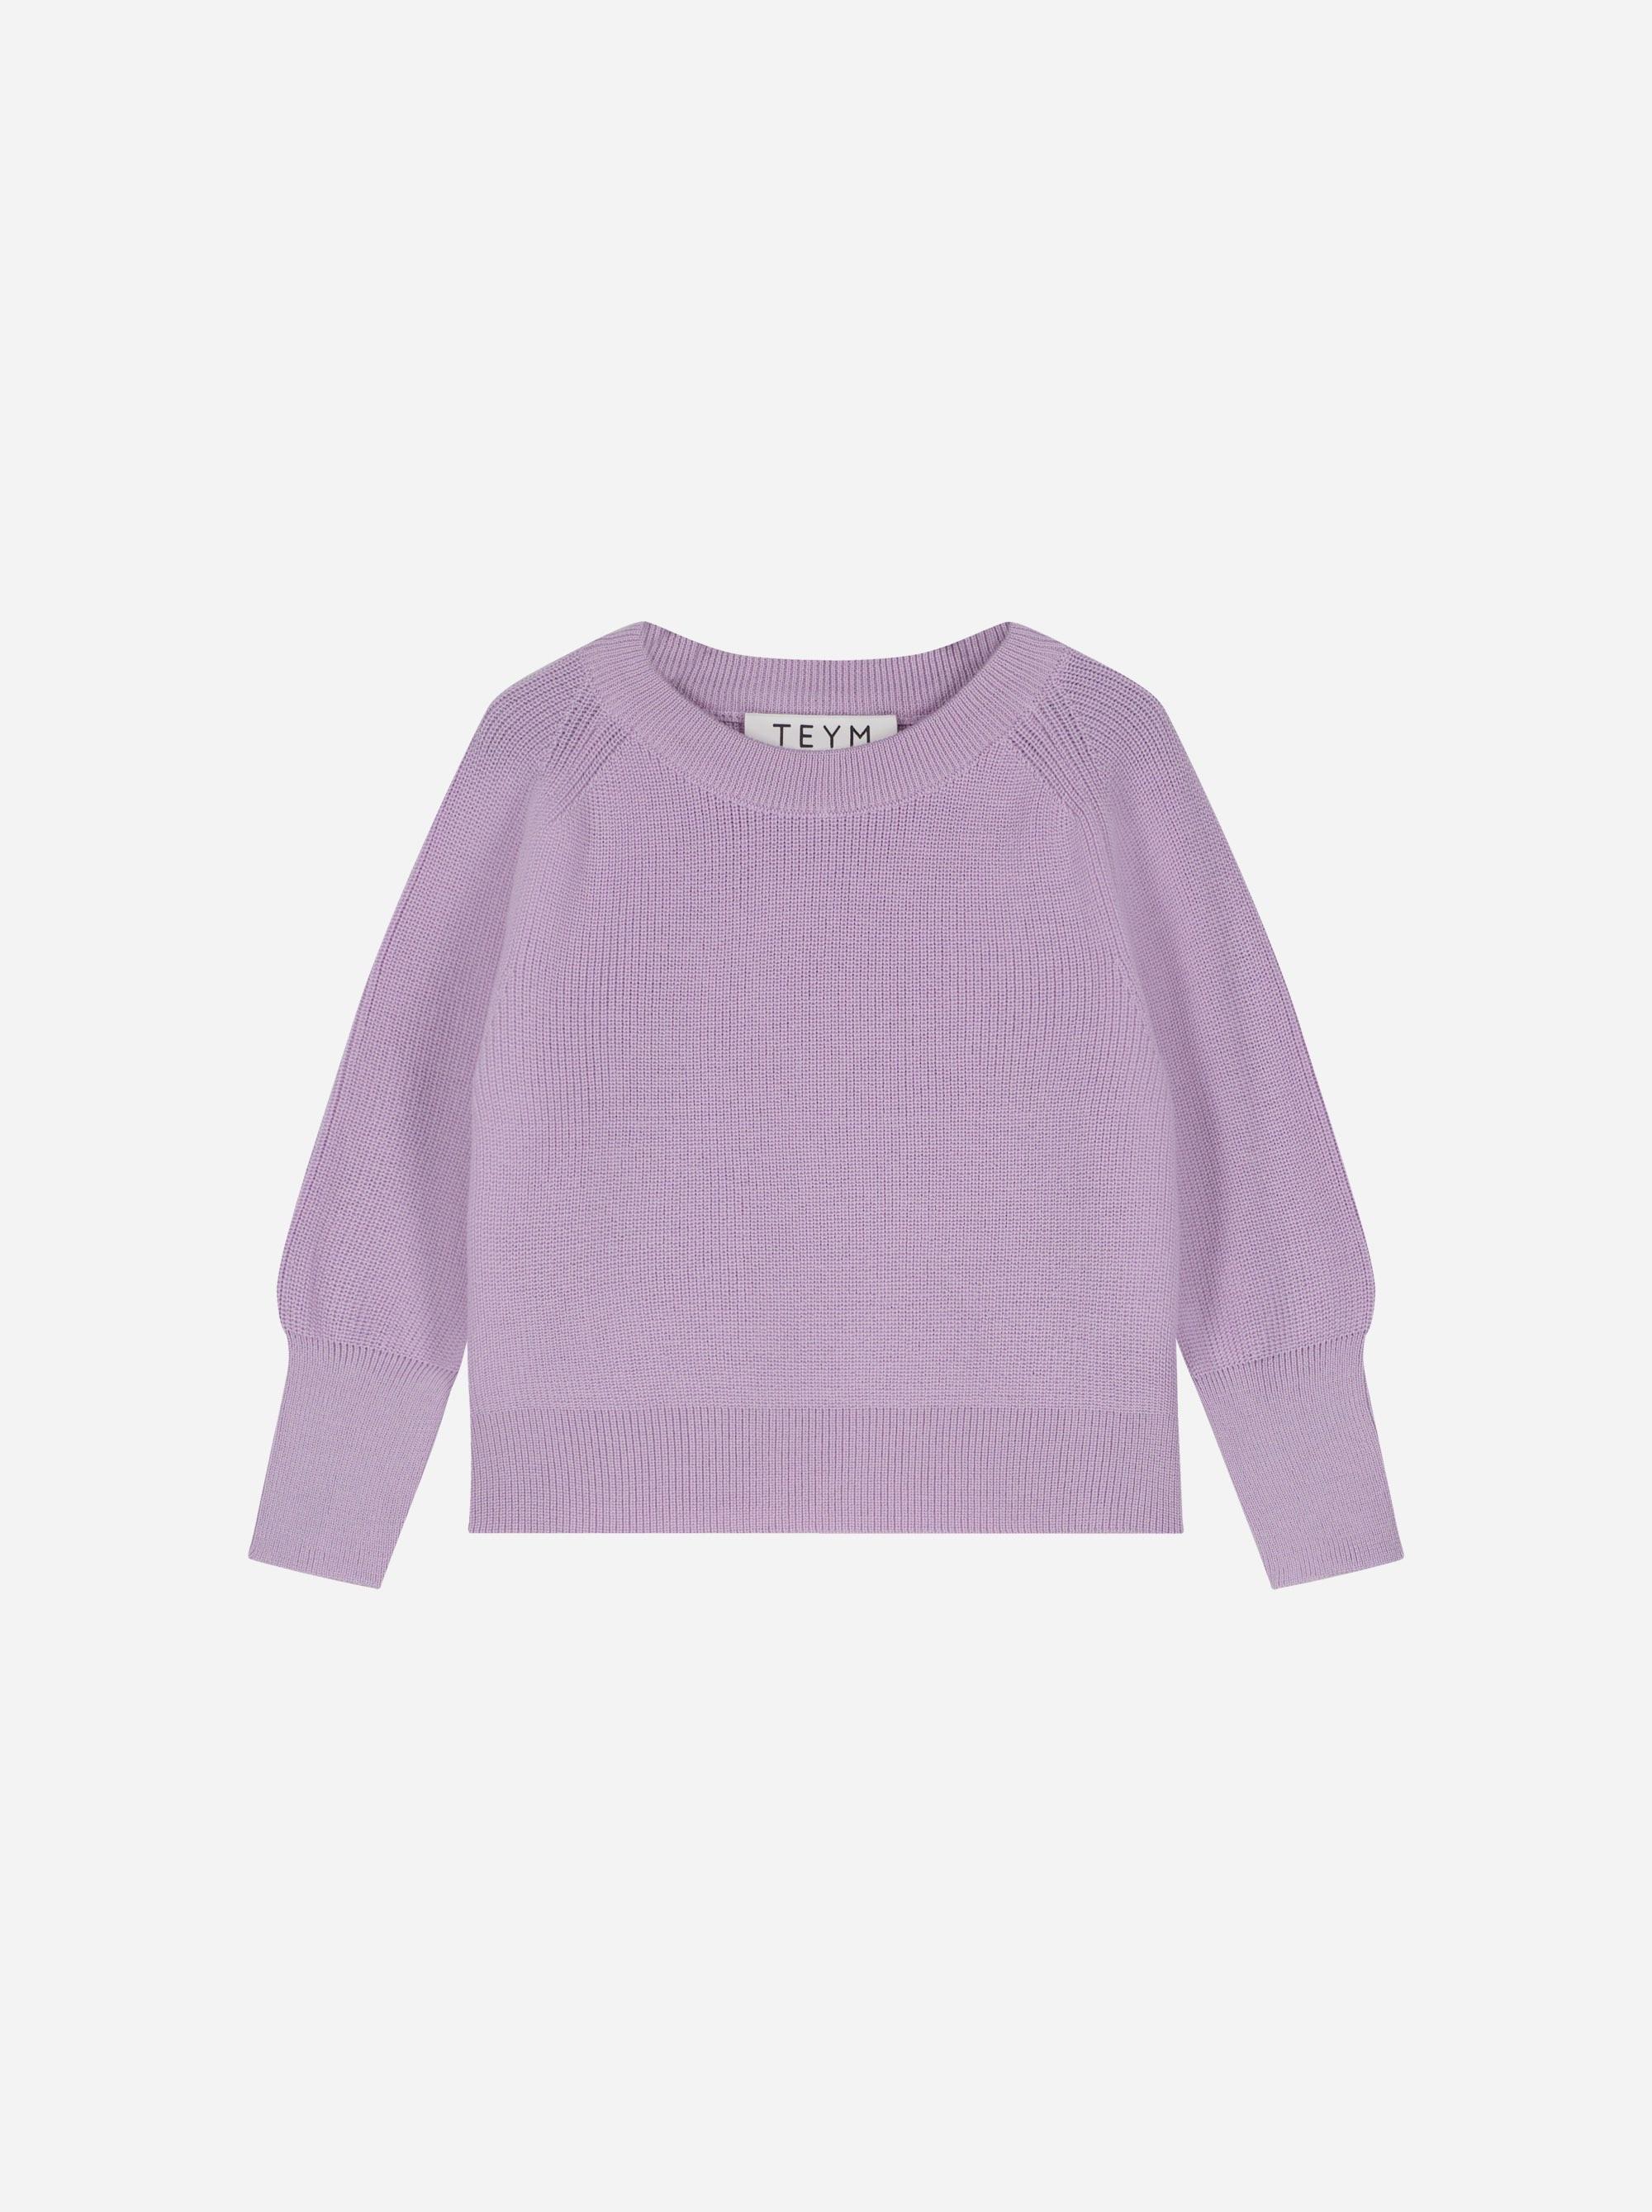 Teym_Merino Sweater_Lila_Kids_front_1